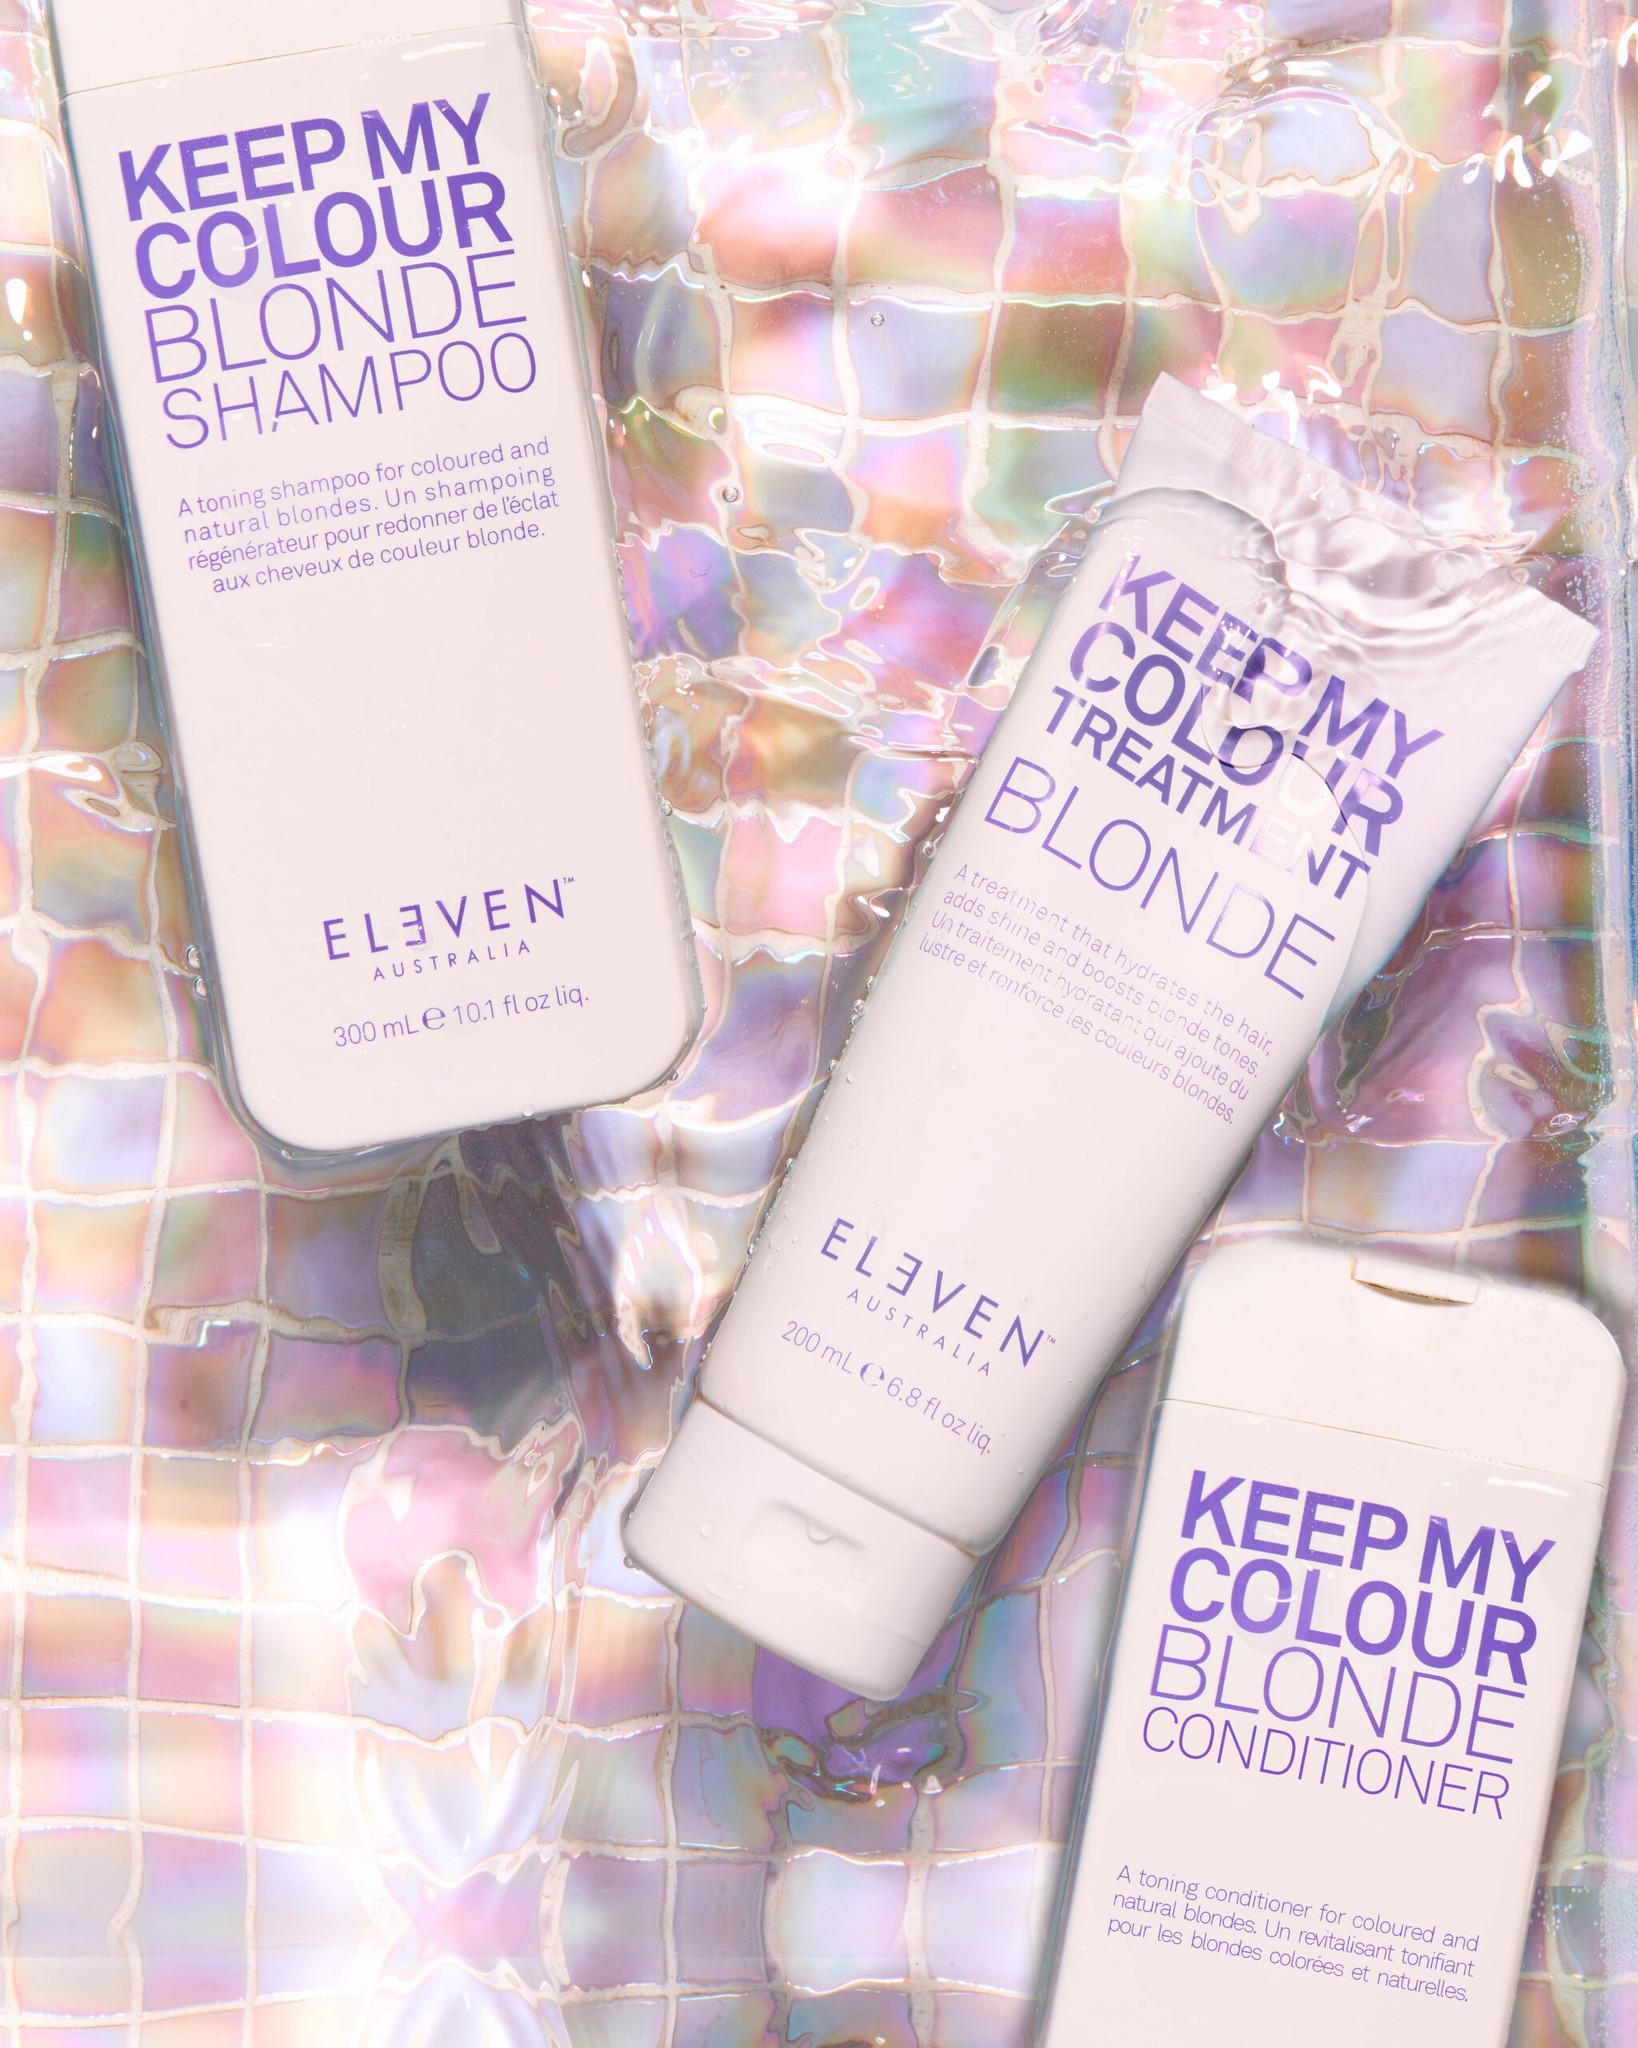 Eleven Australia Keep My Colour Blonde Conditioner